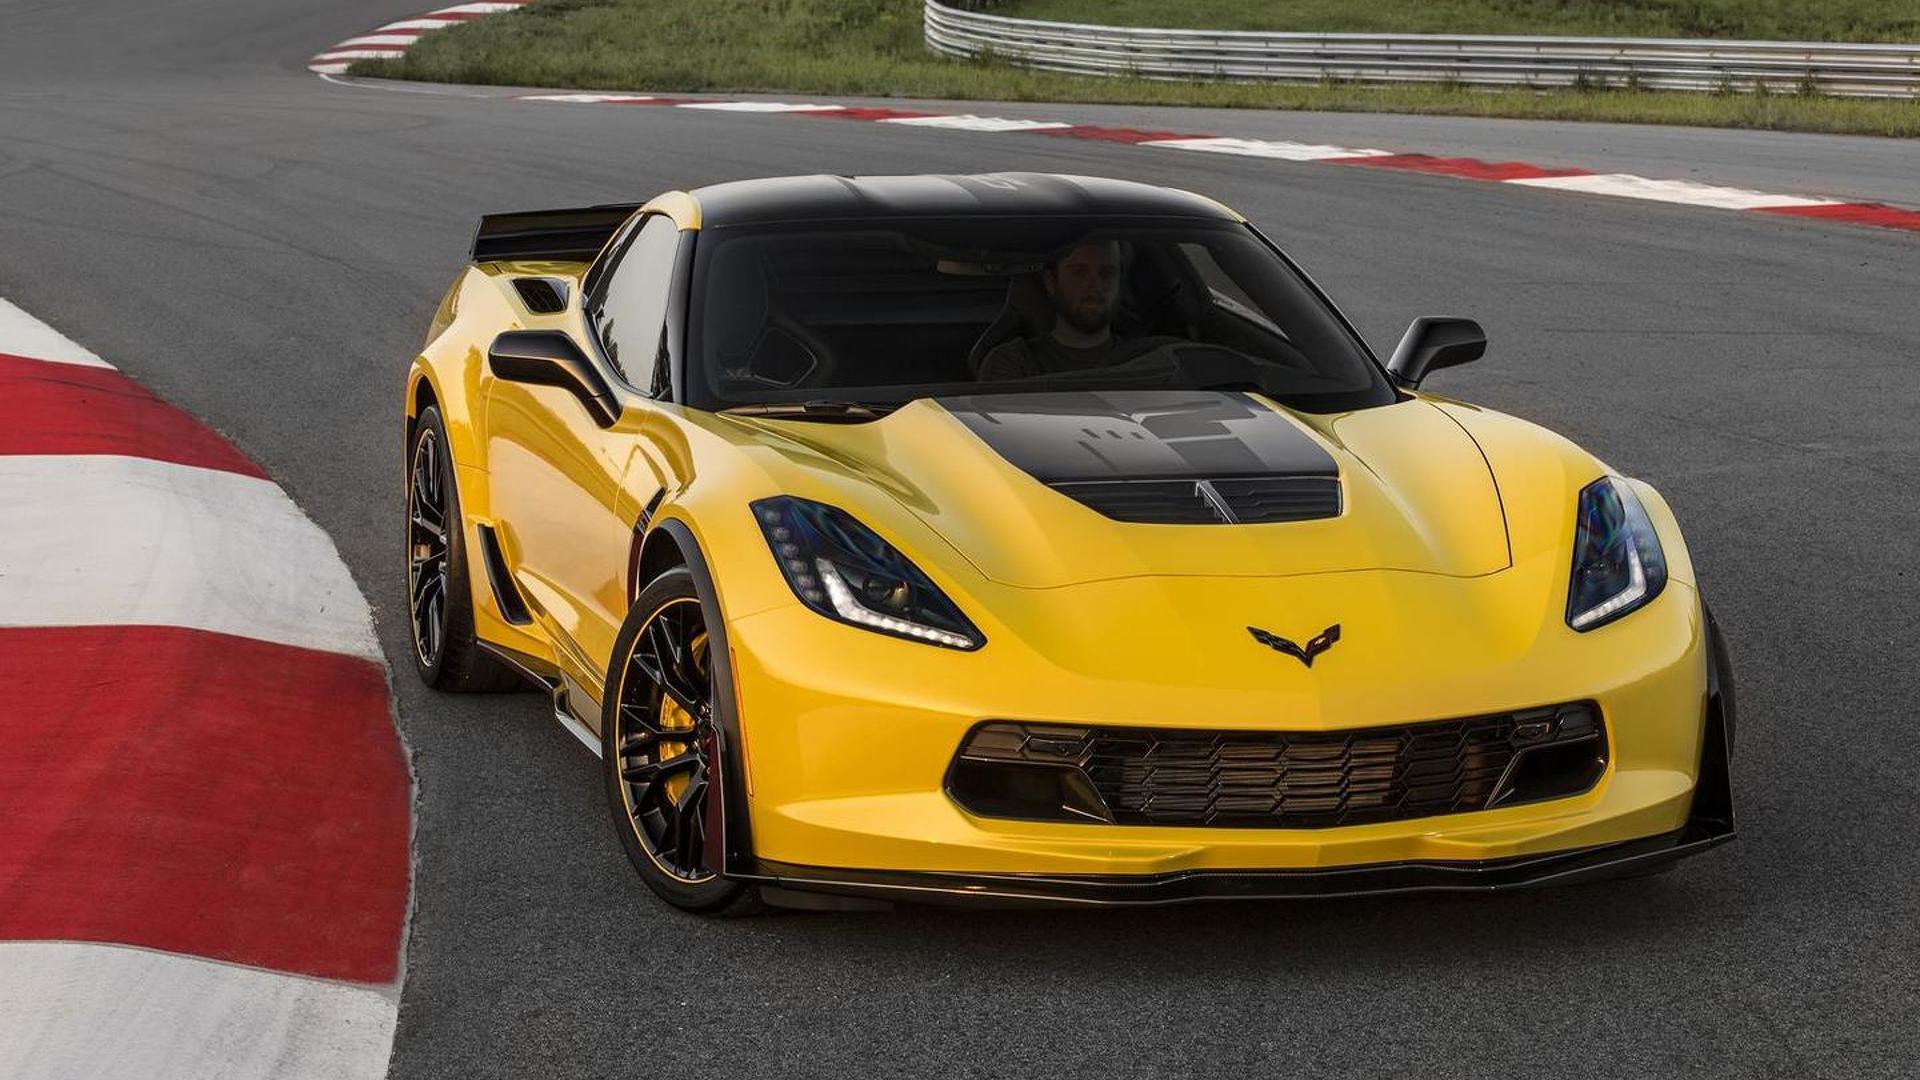 Chevrolet unveils 2016 Corvette Z06 C7.R Edition with hardware upgrades